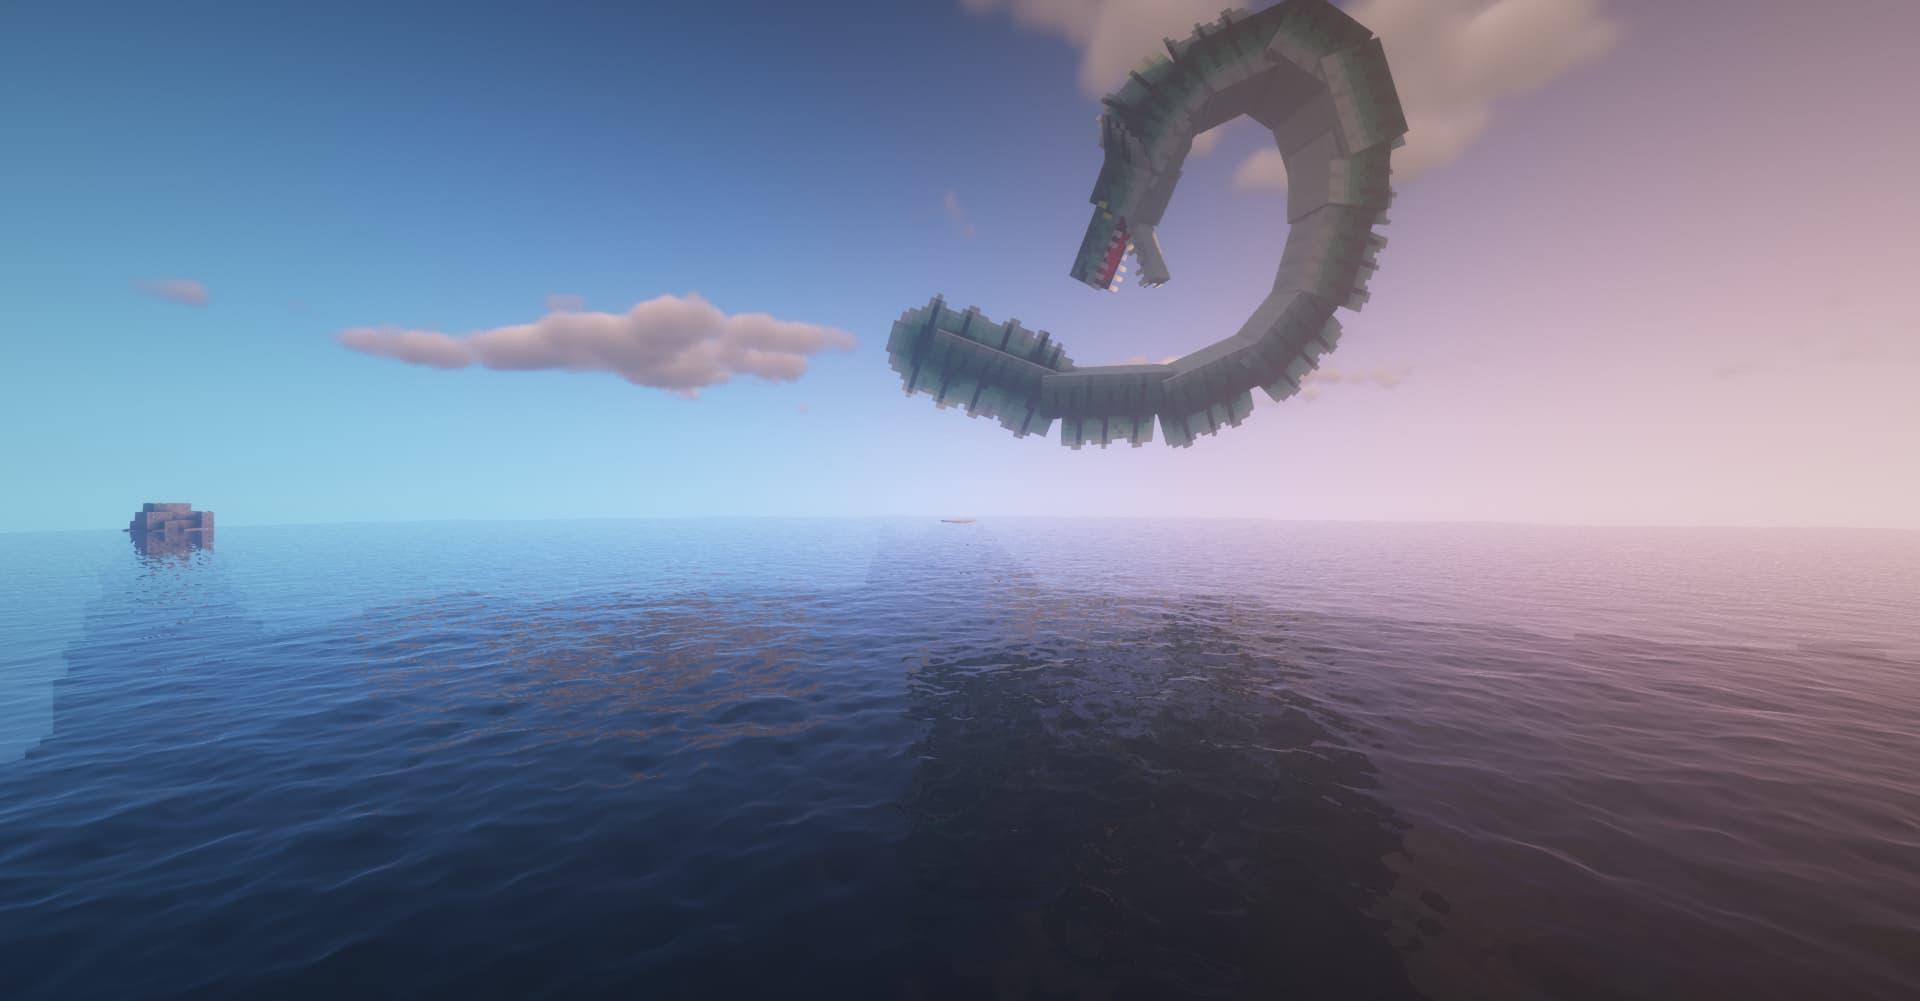 serpent de mer attaque